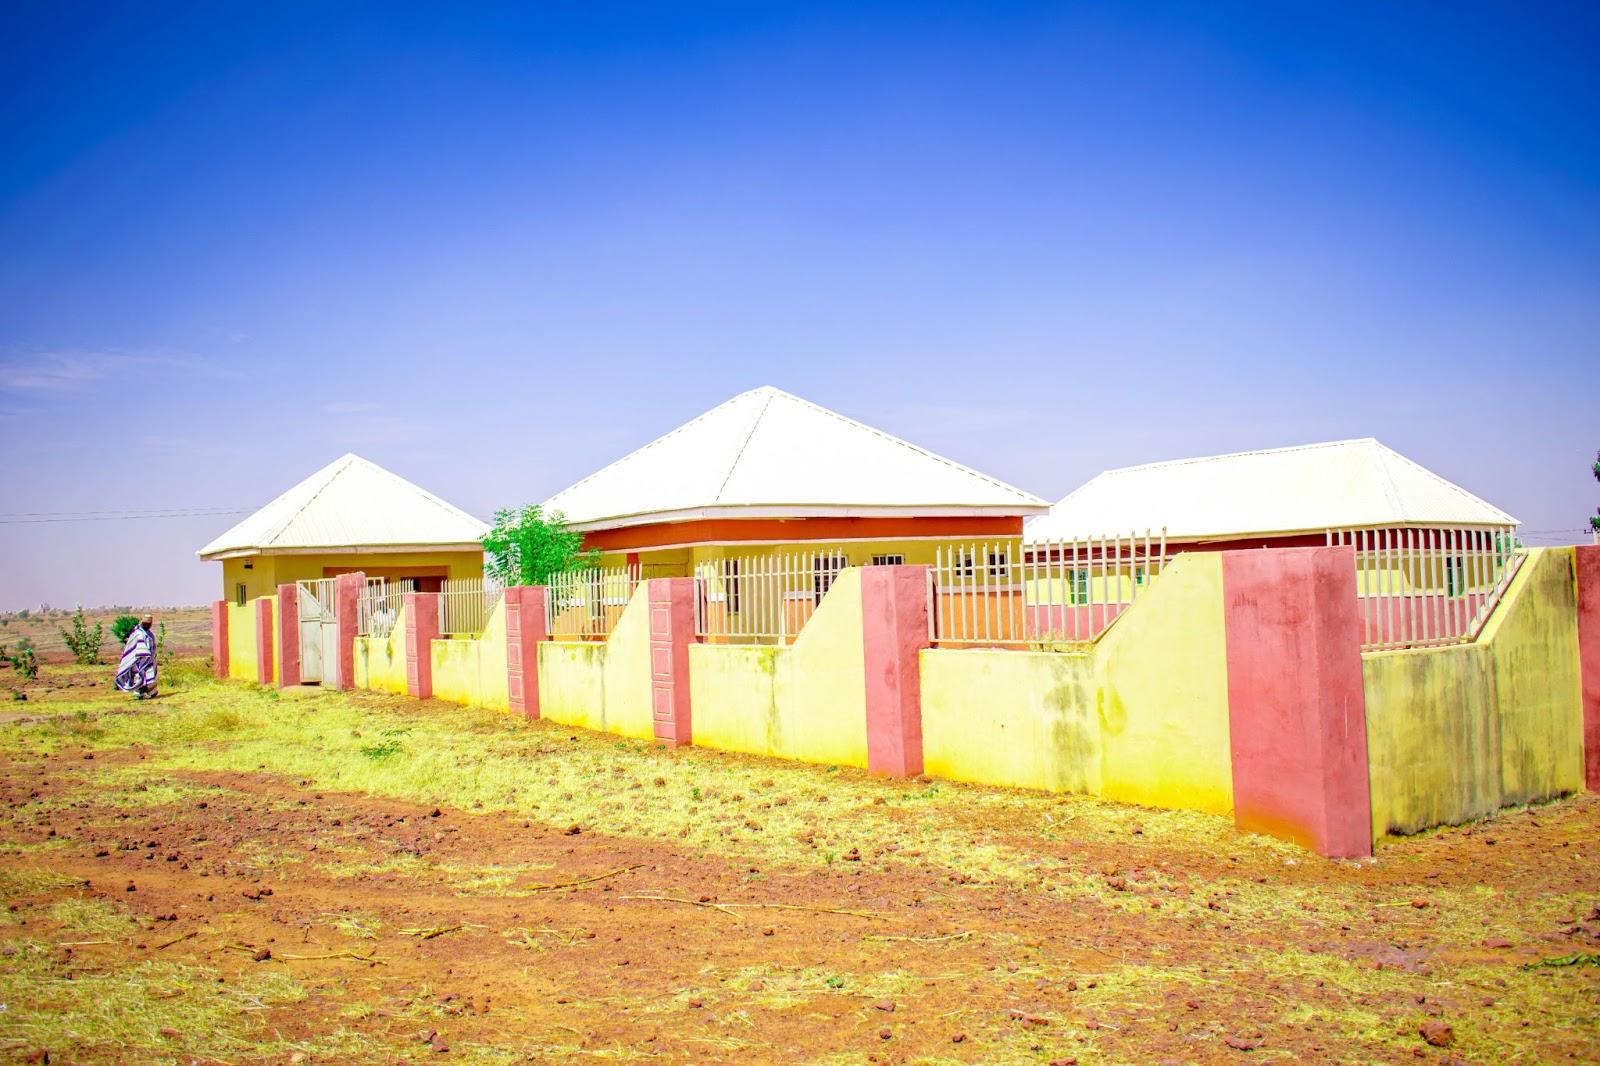 Primary Health Centre at Jema, Gwadabawa LGA, Sokoto State. Photo Credit: Qosim Suleiman